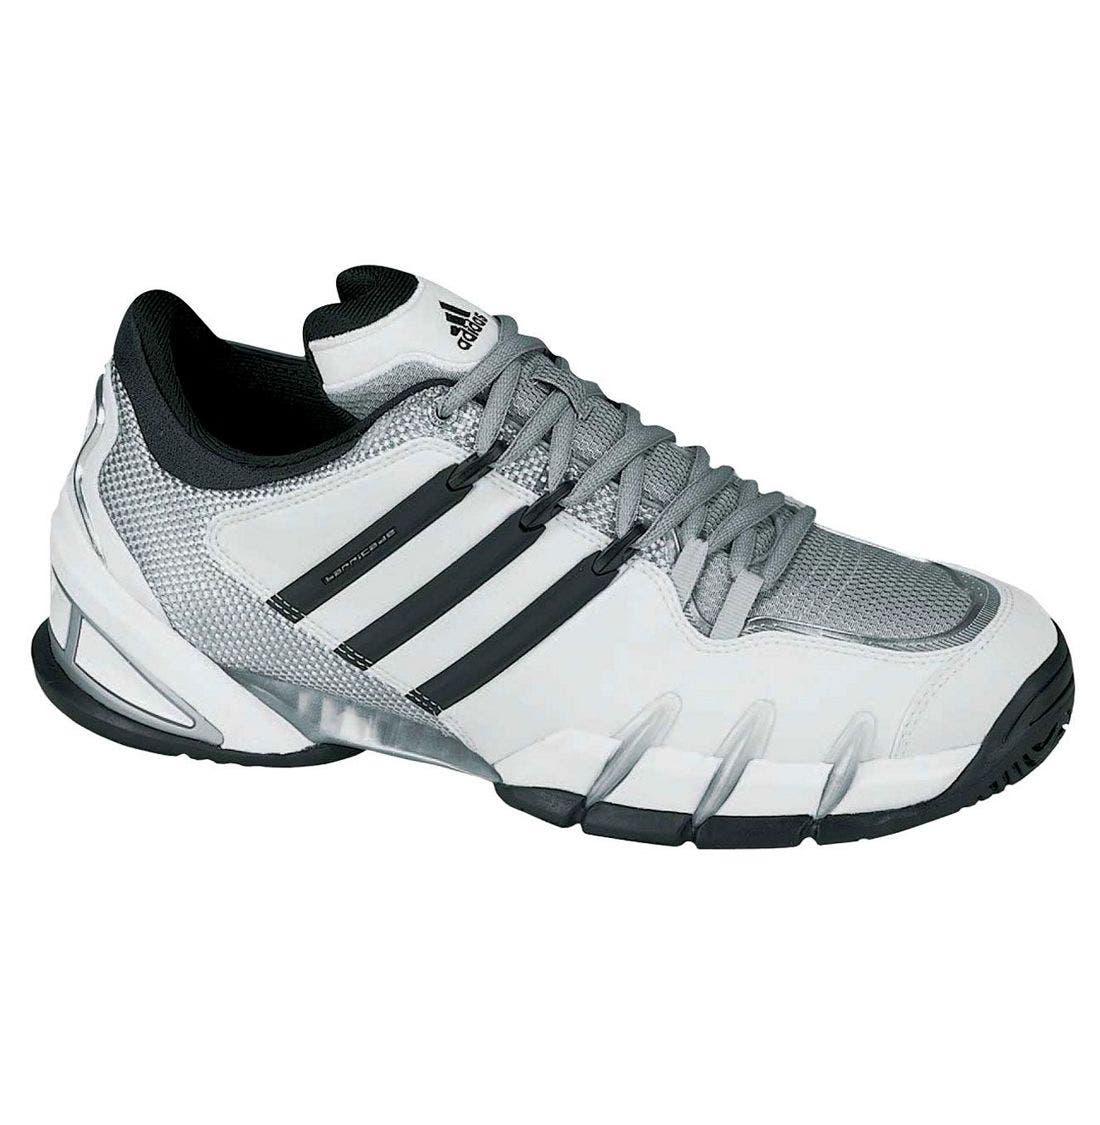 ADIDAS 'Barricade III' Tennis Shoe, Main, color, WBL